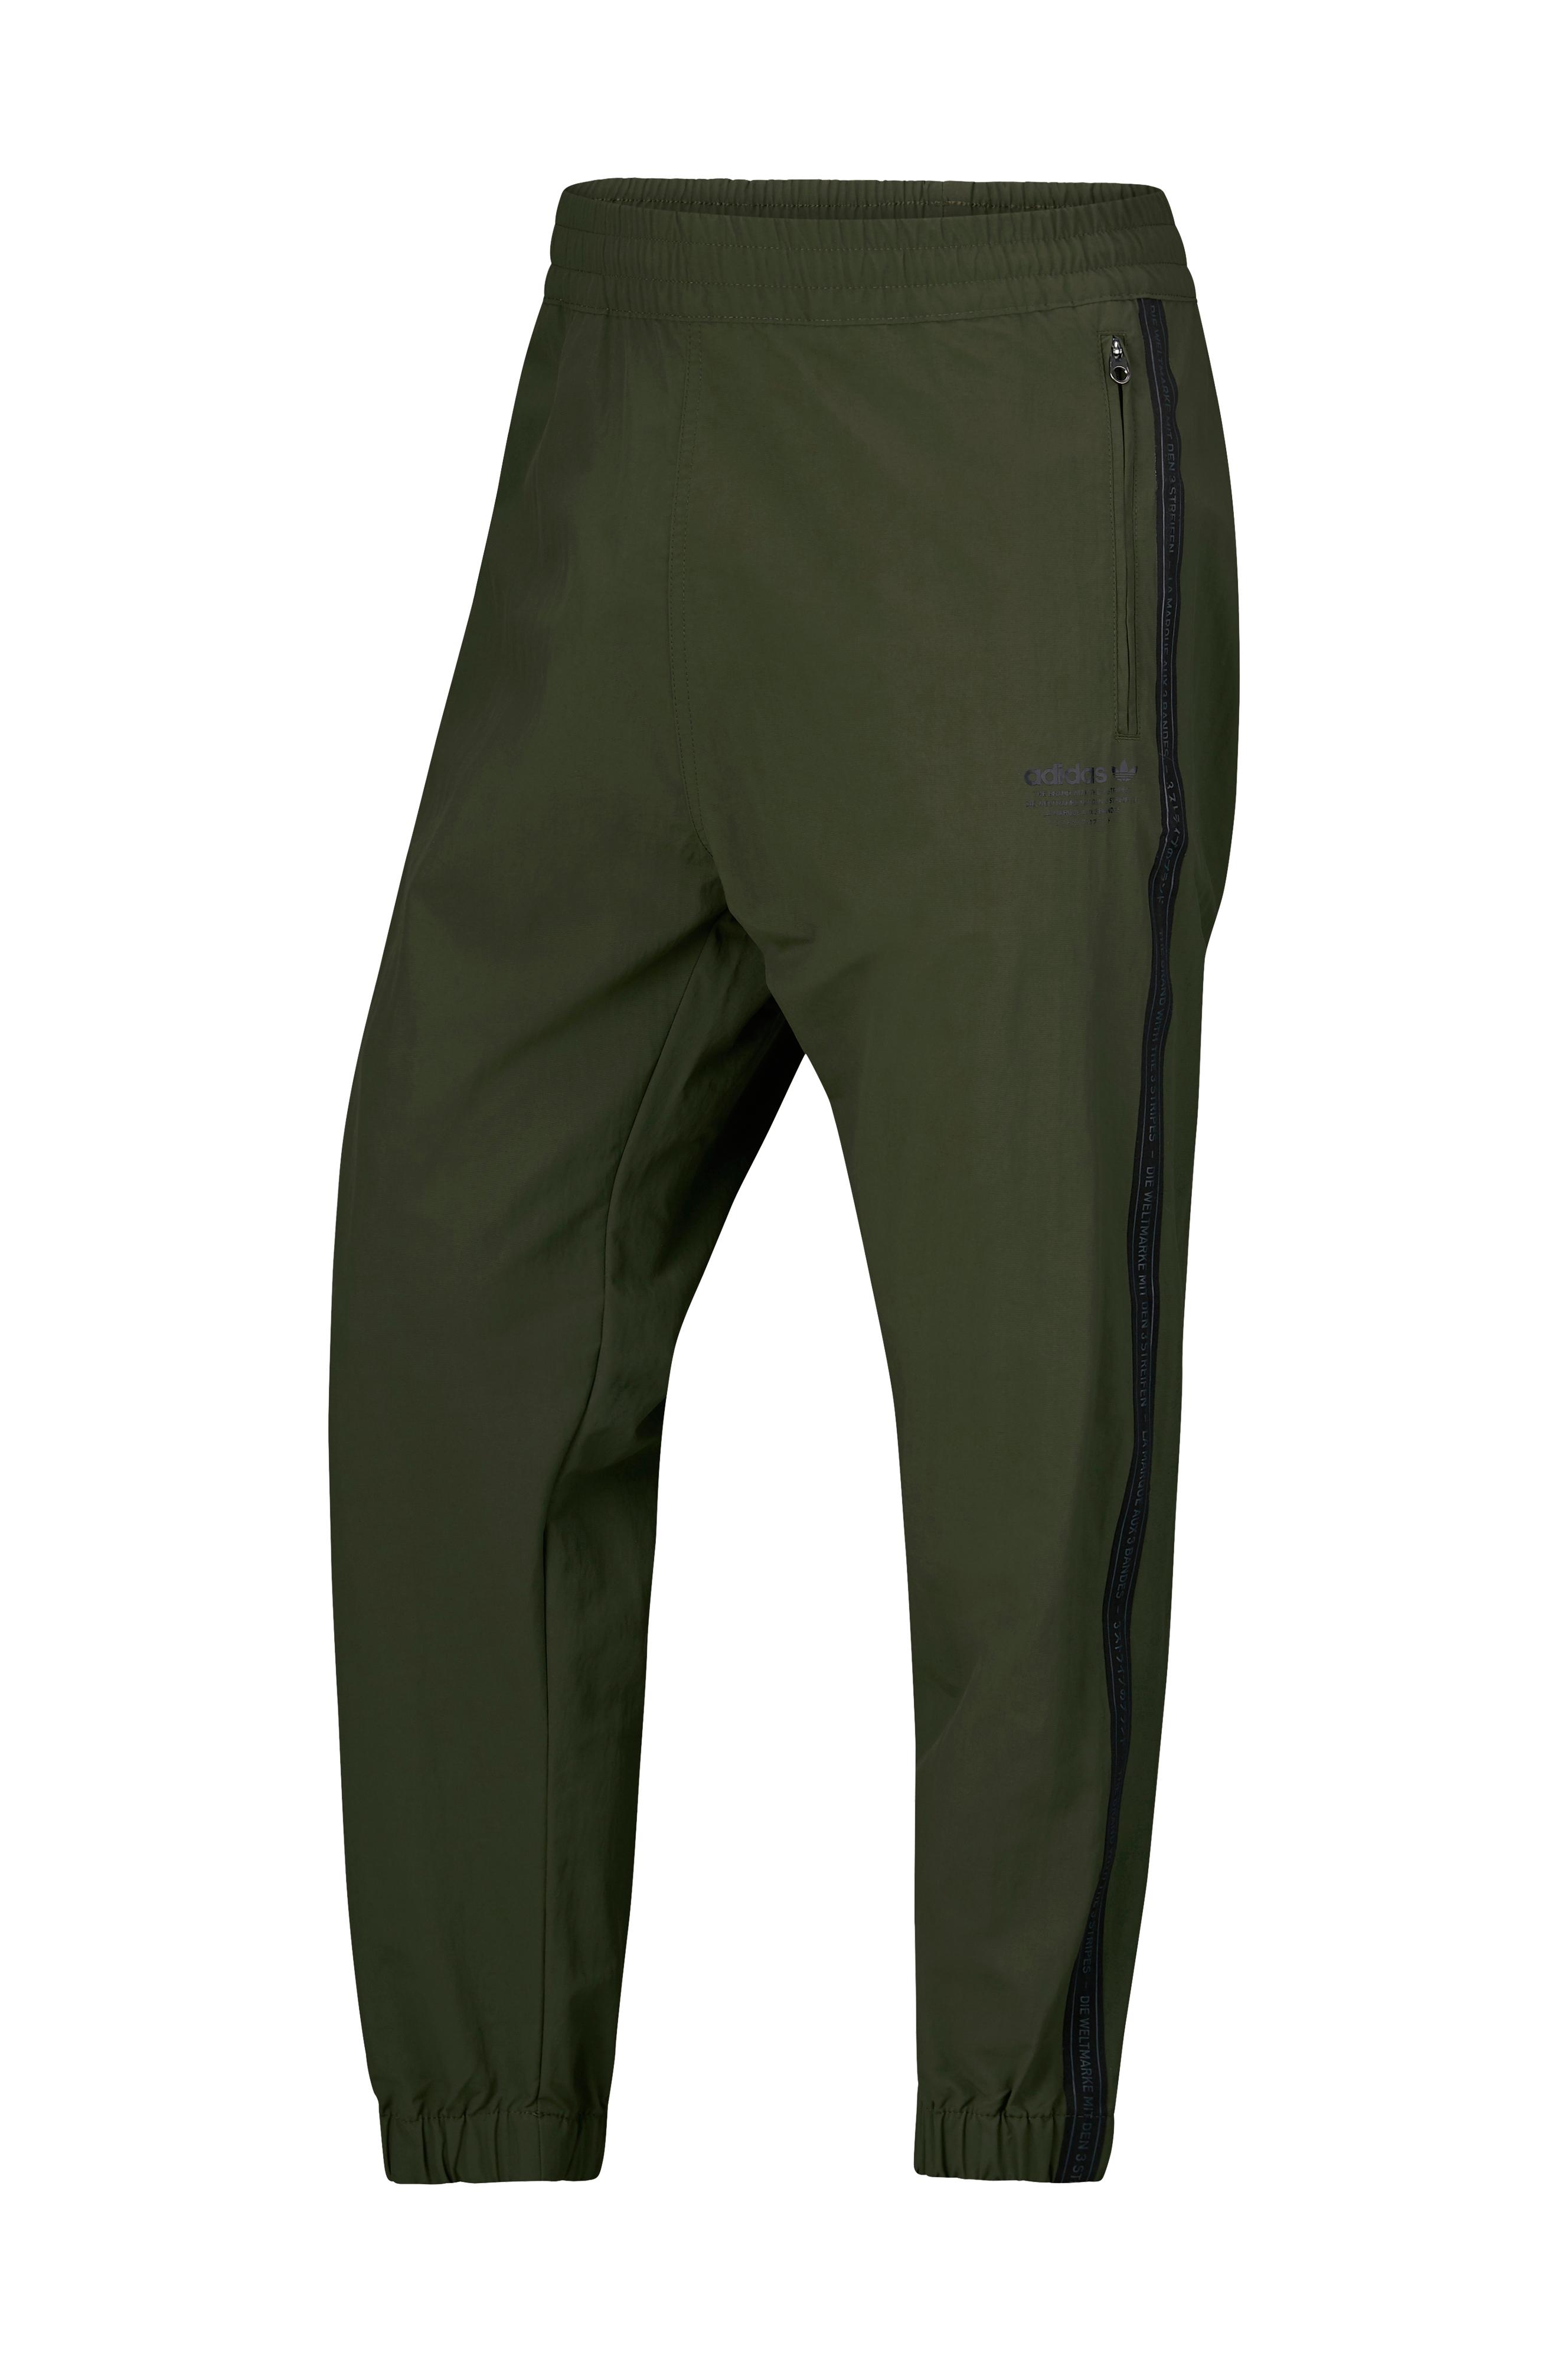 Adidas NMD Track Pants Night Cargo